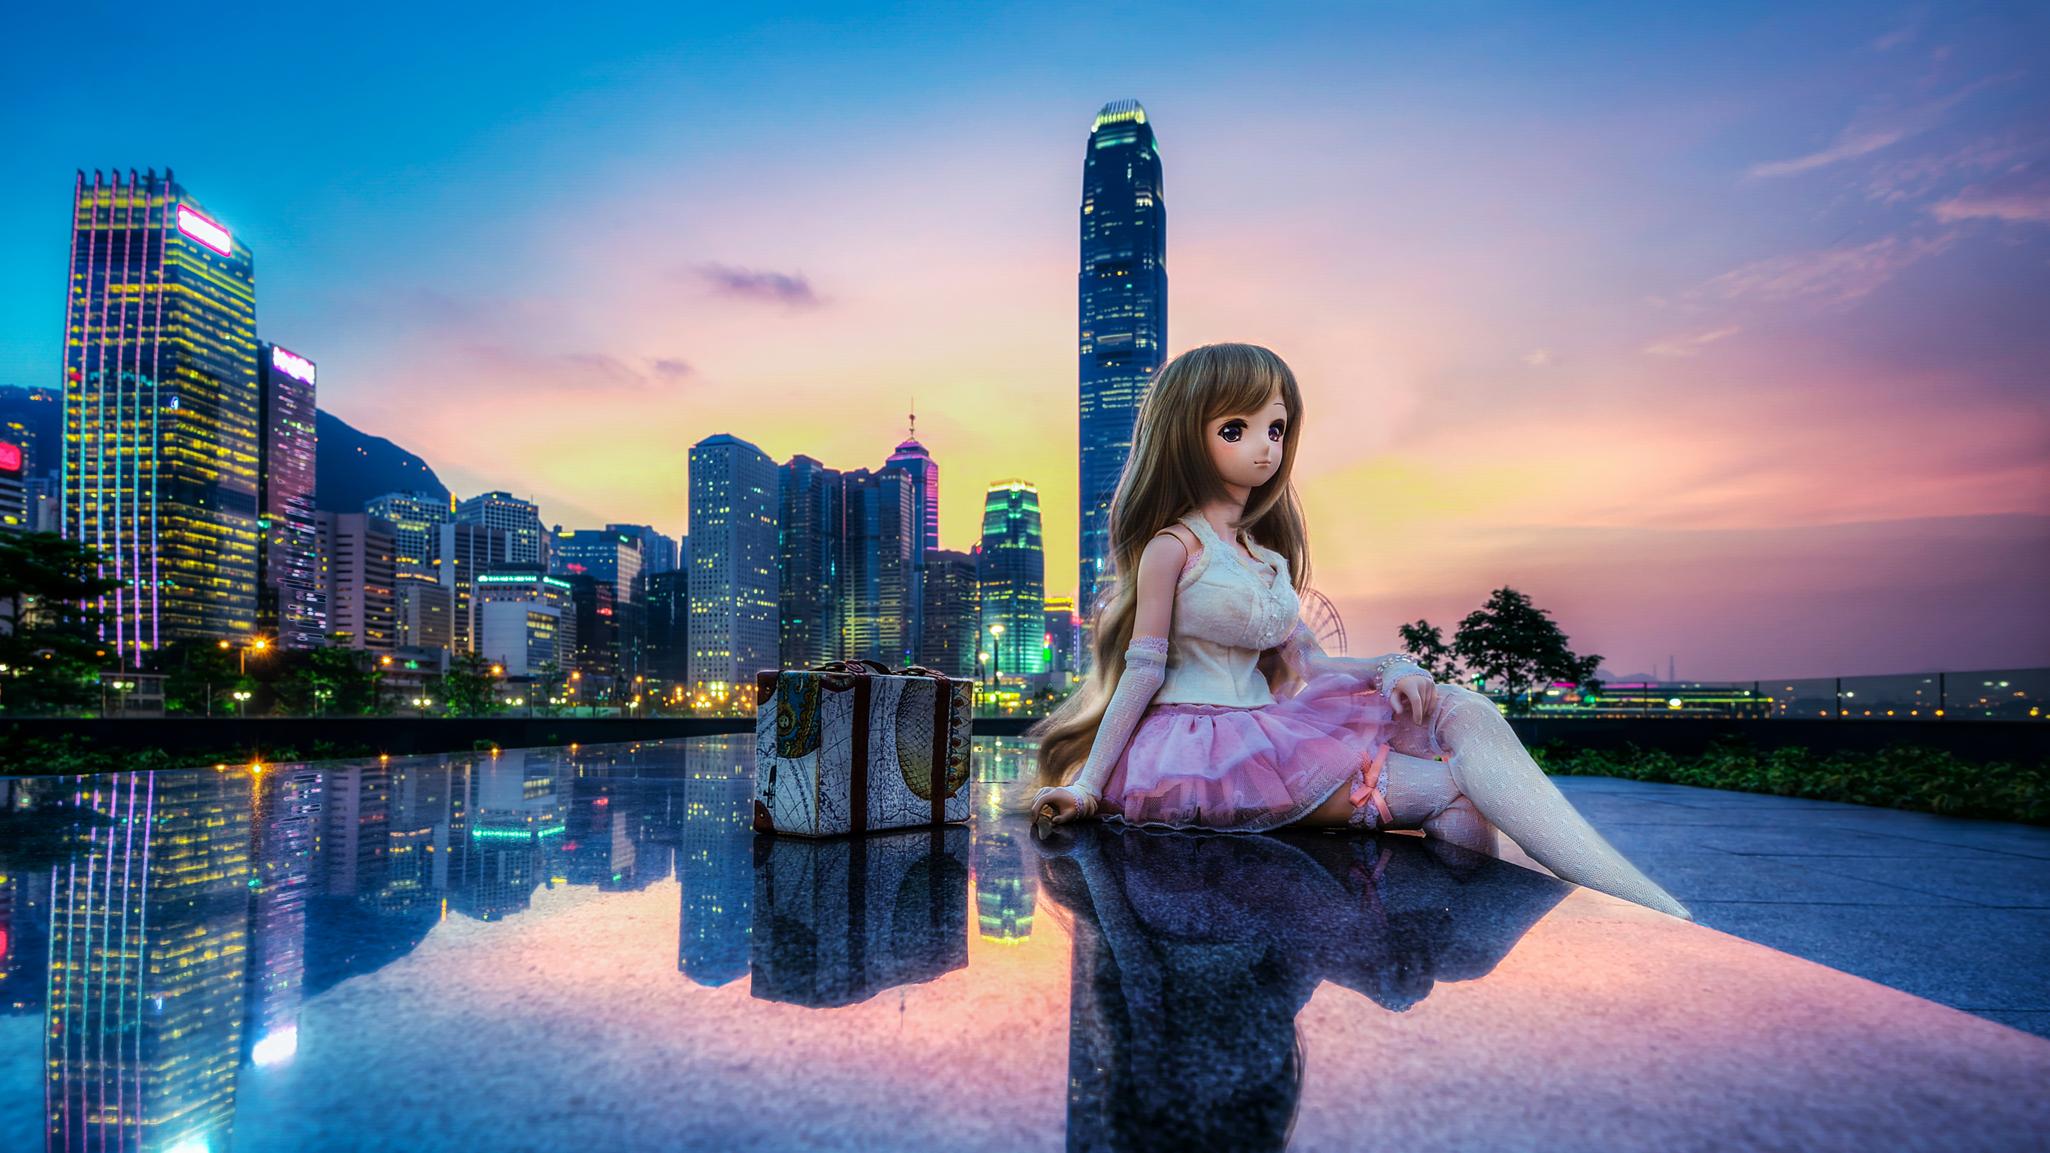 volks dollfie_dream morikawa_yuki white_album zoukei-mura misaki_serika